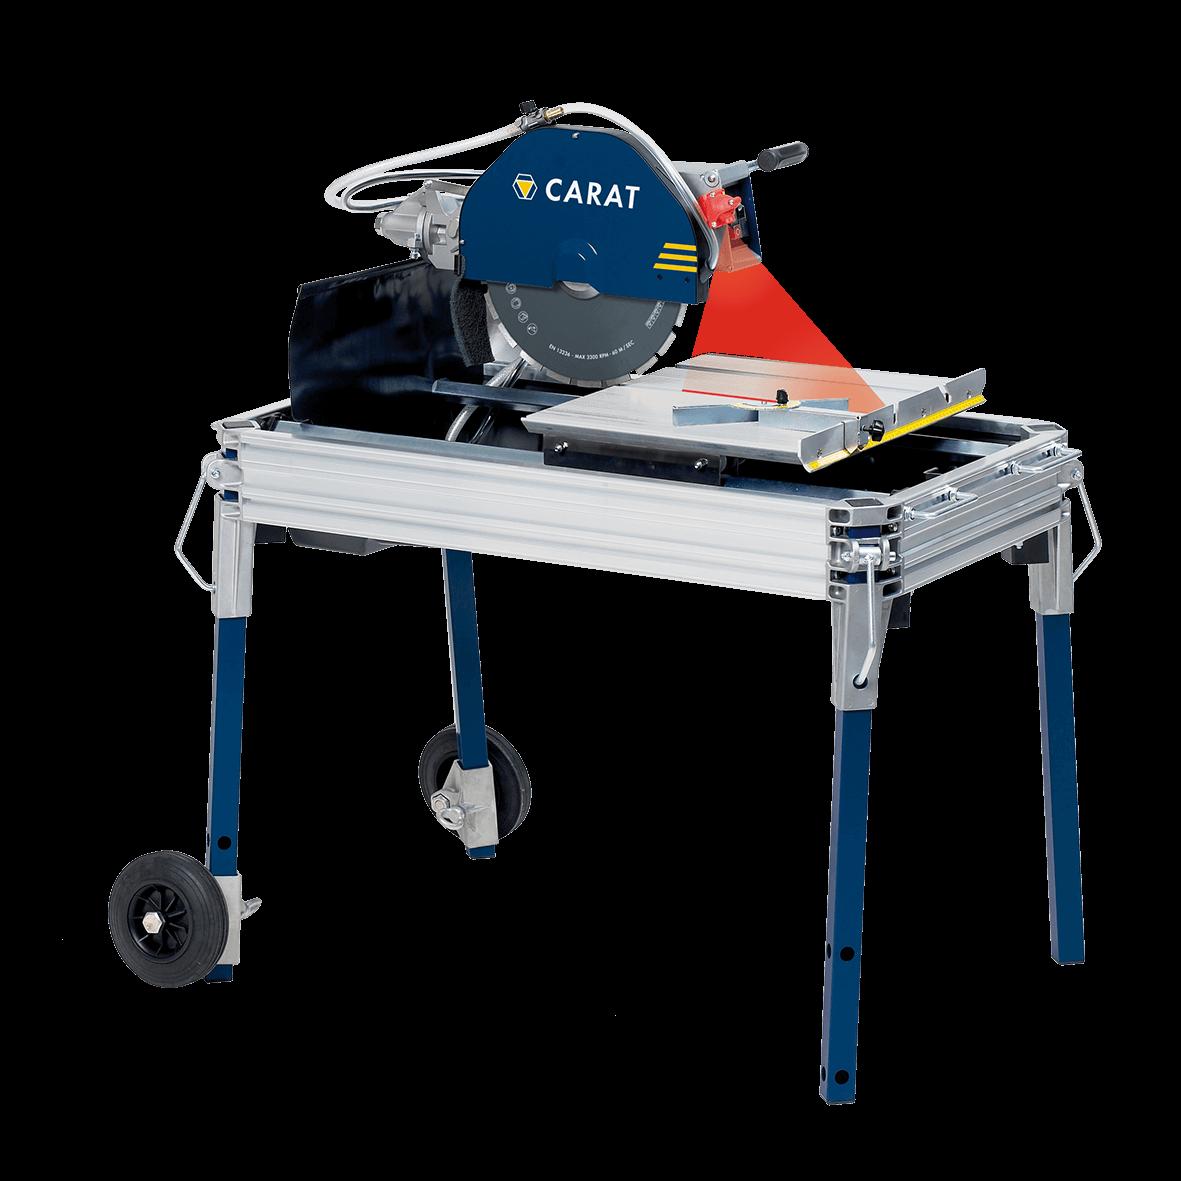 Carat T-3510 laser steenzaagmachine (230v)